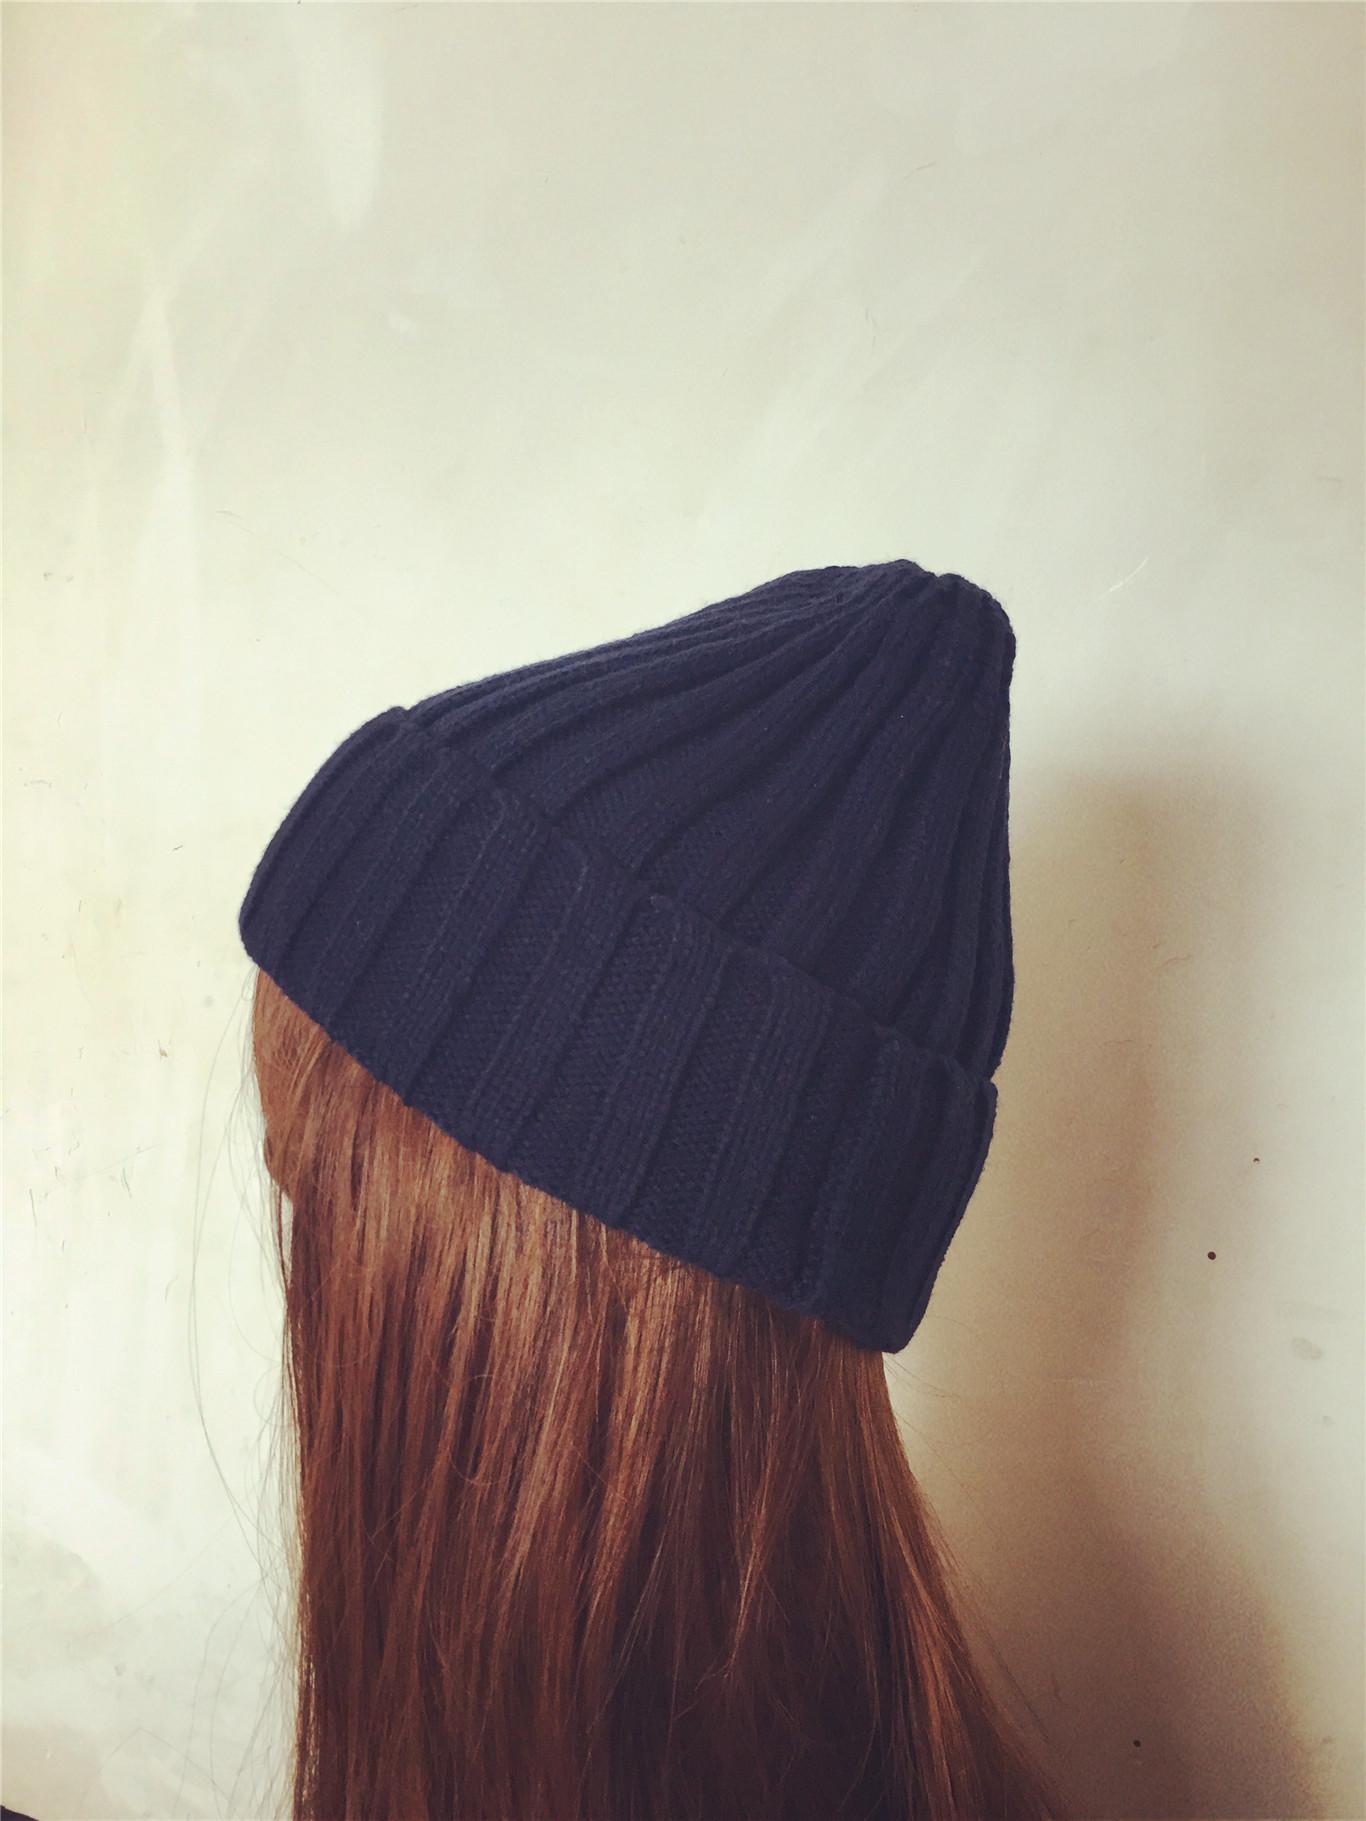 c7f9991ba1fac FREE SHIPPING Women s Winter Warm Knit Hip-hop Unisex Beanie Hat Cap ...